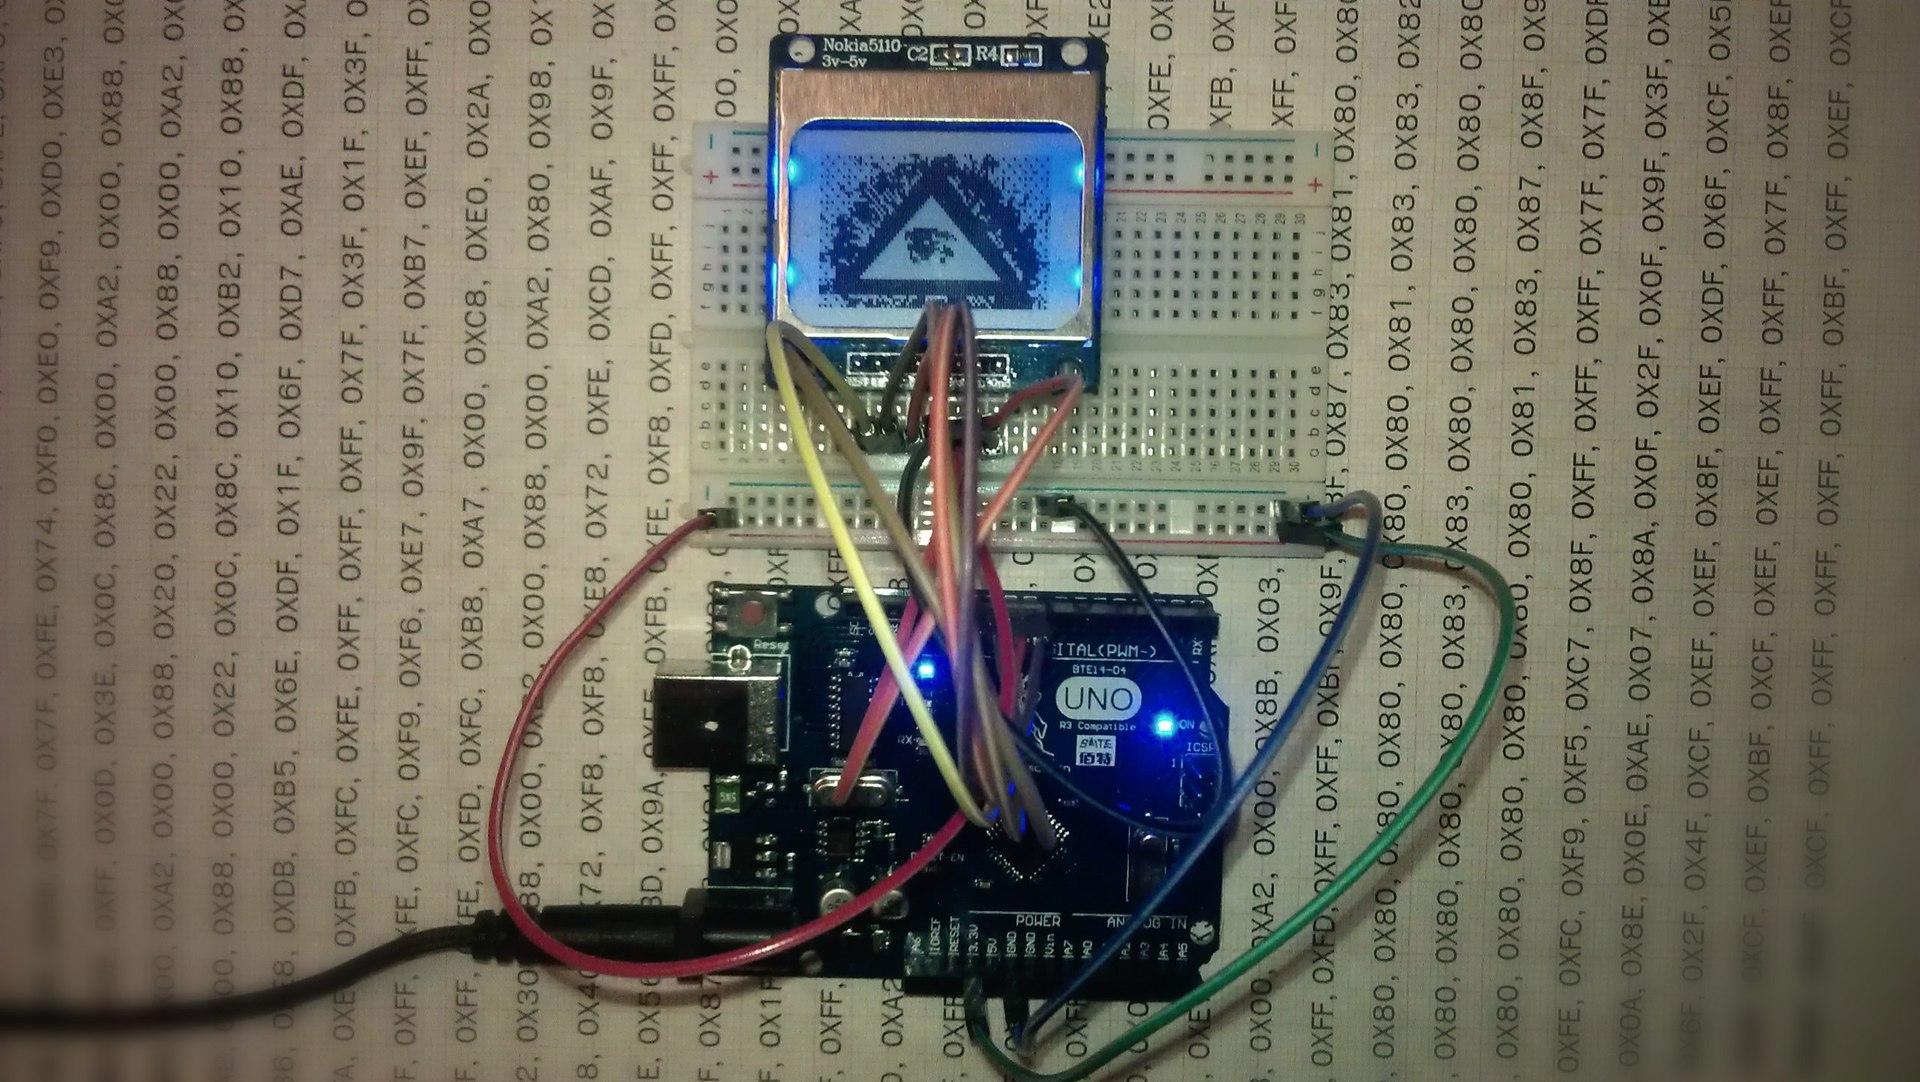 Arduino, модуль Nokia 5110 LCD и любая картинка - 1